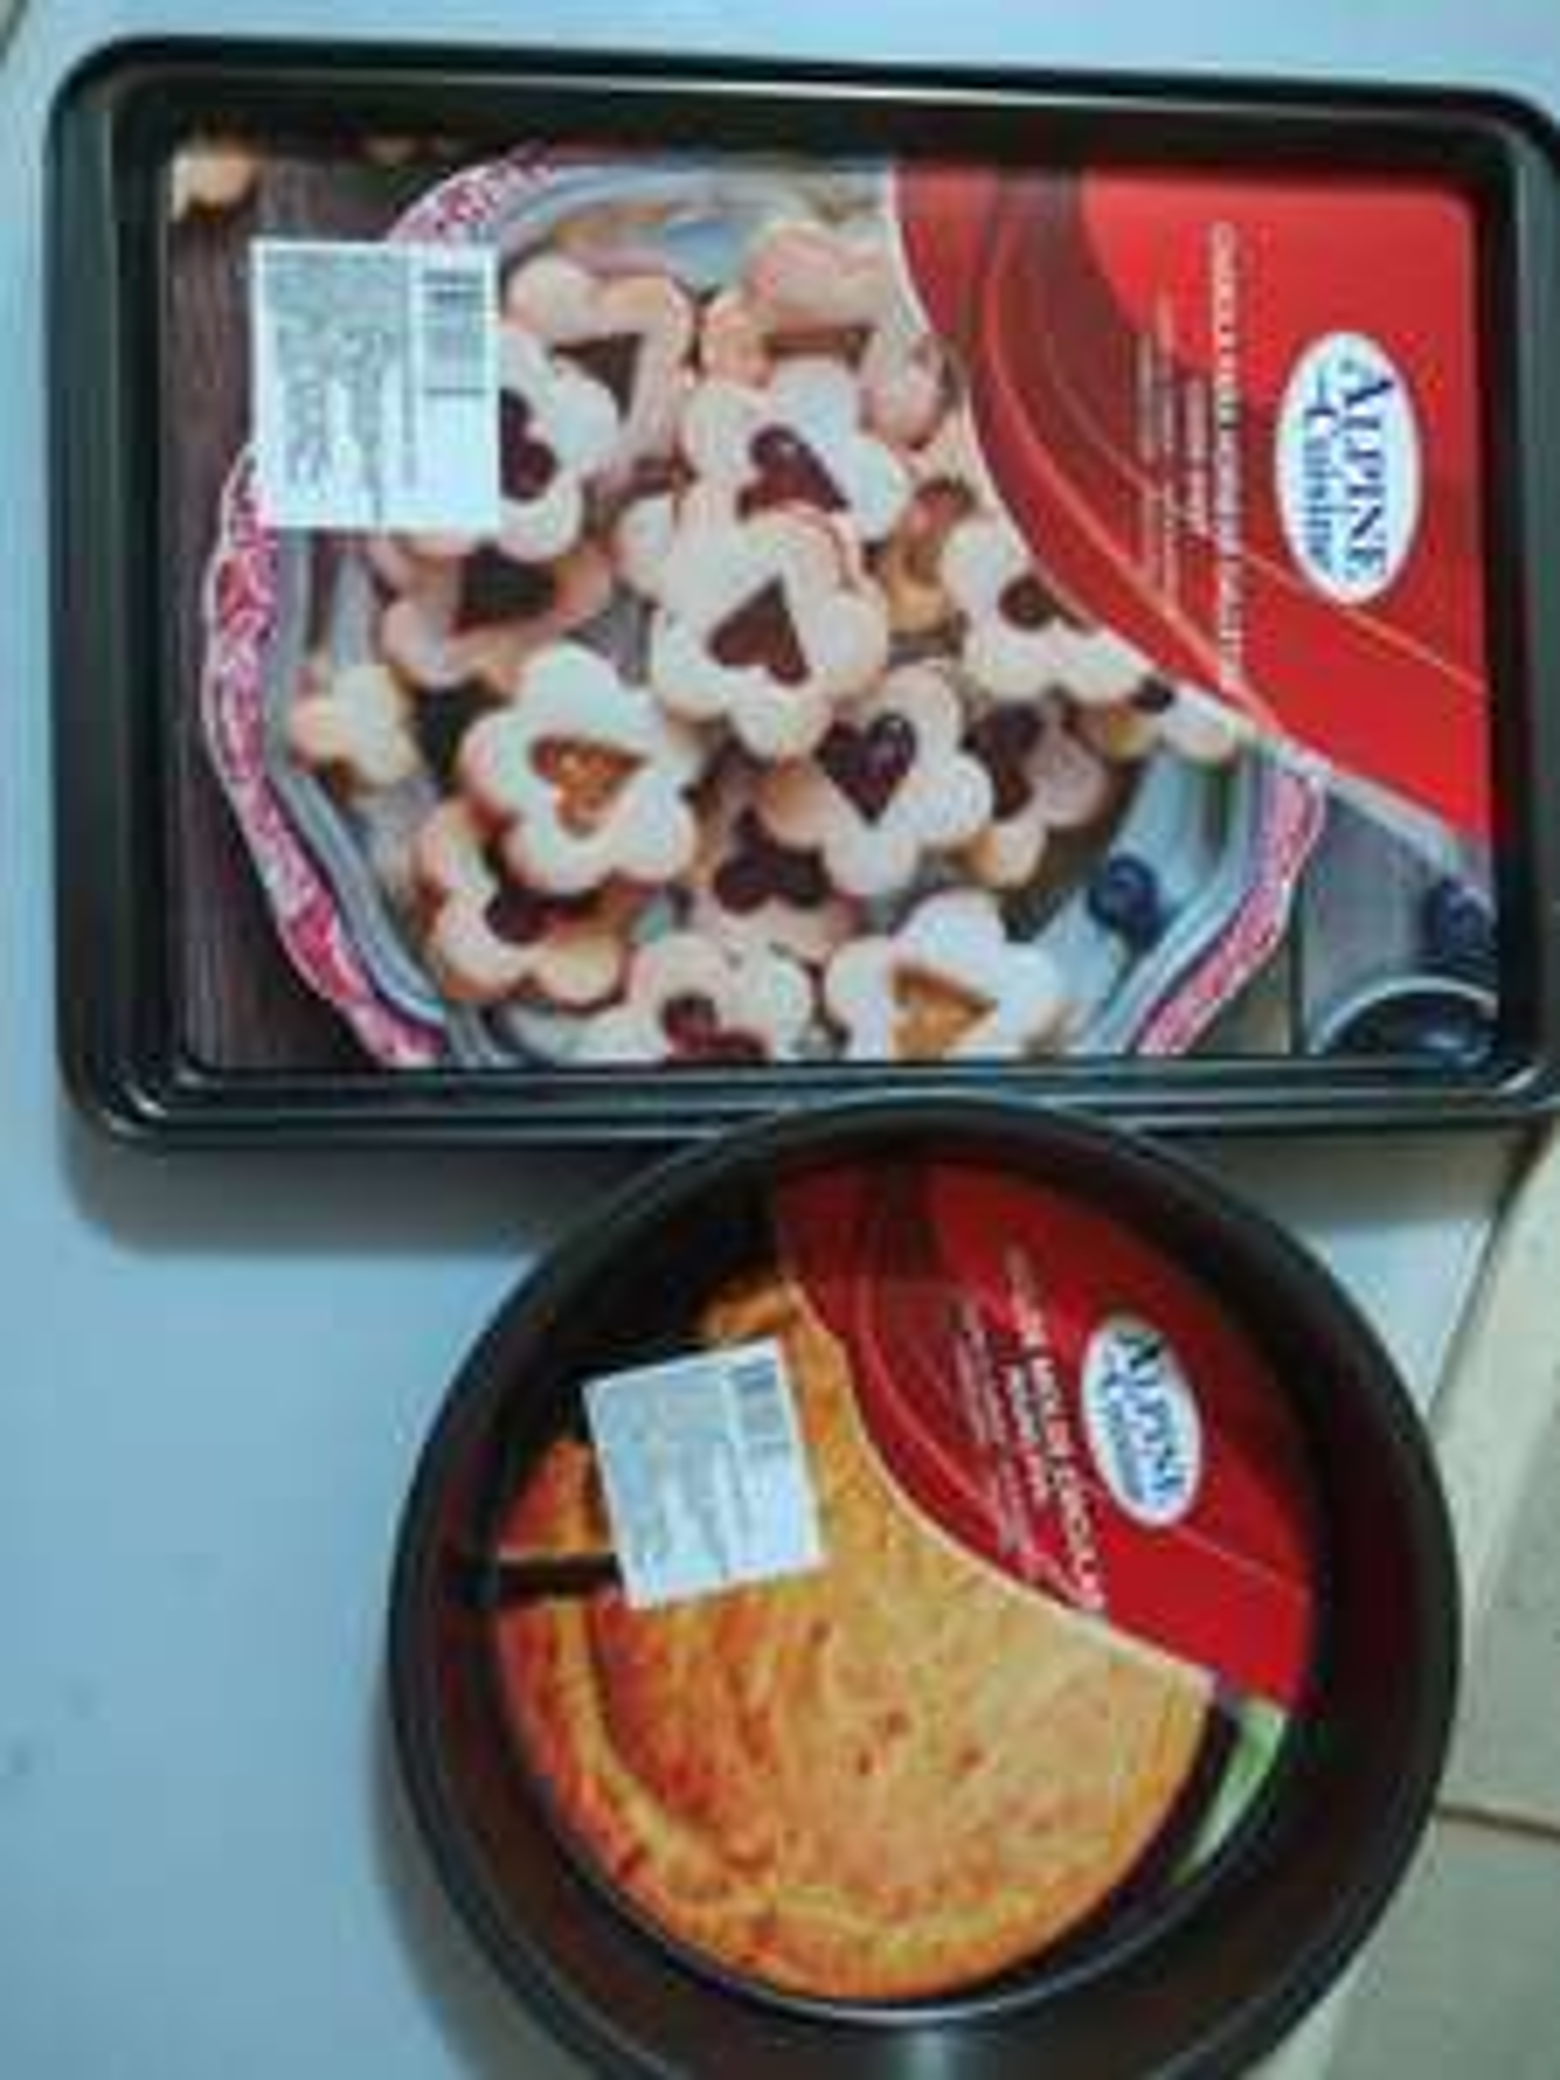 Bodega Aurrerá: molde para horno y charola antiadherentes desde 2 pesitos